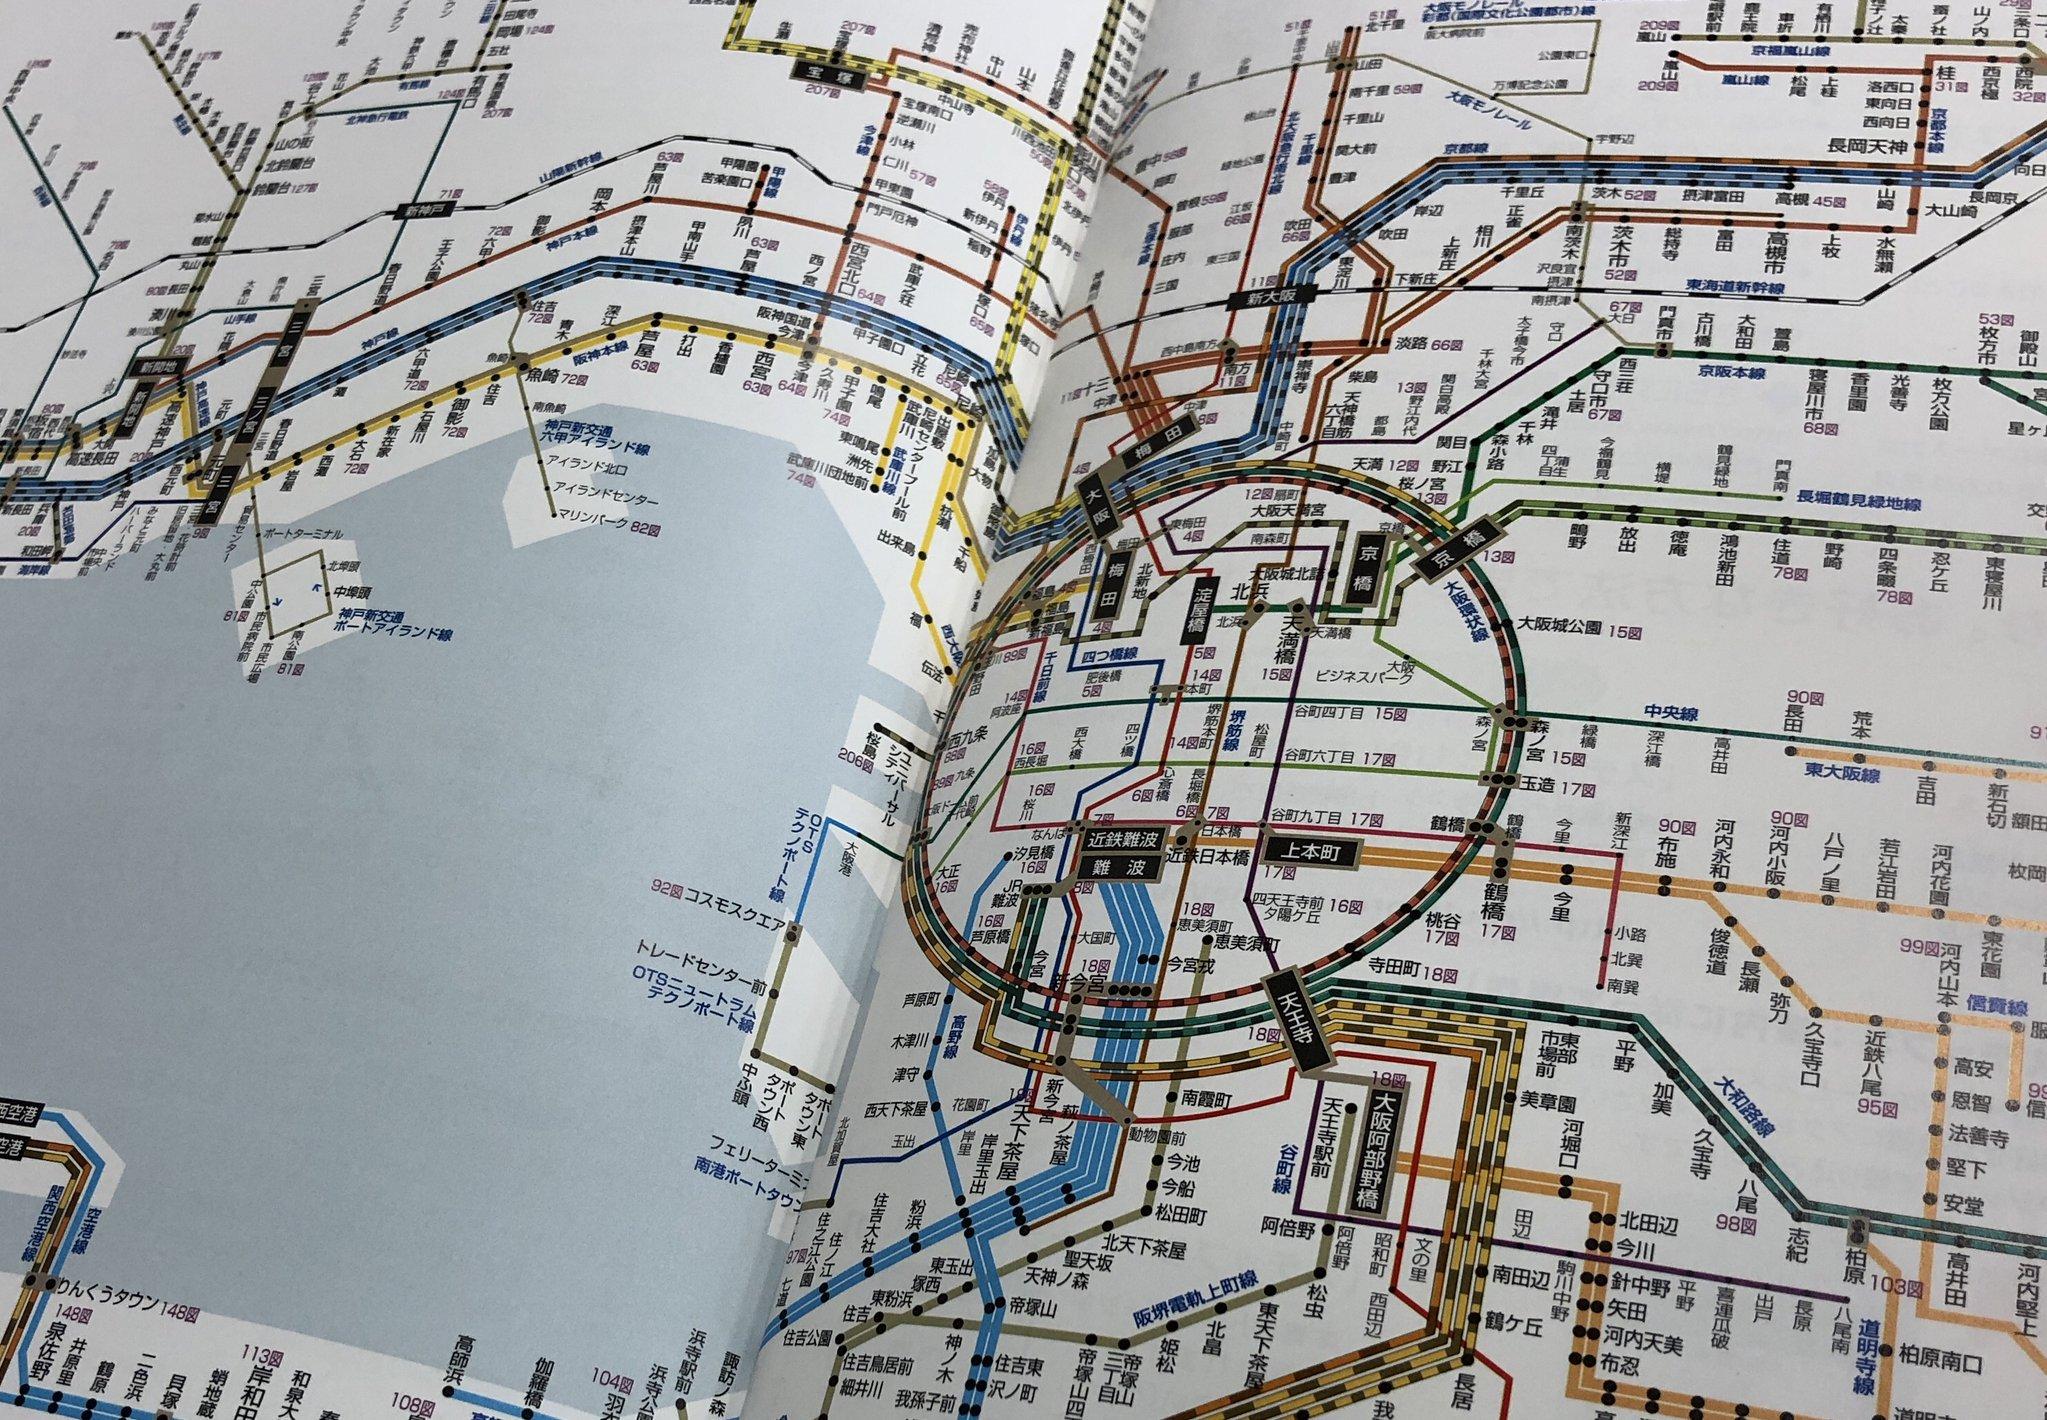 路線図。路線が円形。  アトラスRDX 関西道路地図 B5 (2004年3月発行) https://t.co/ncYpF52Vk1